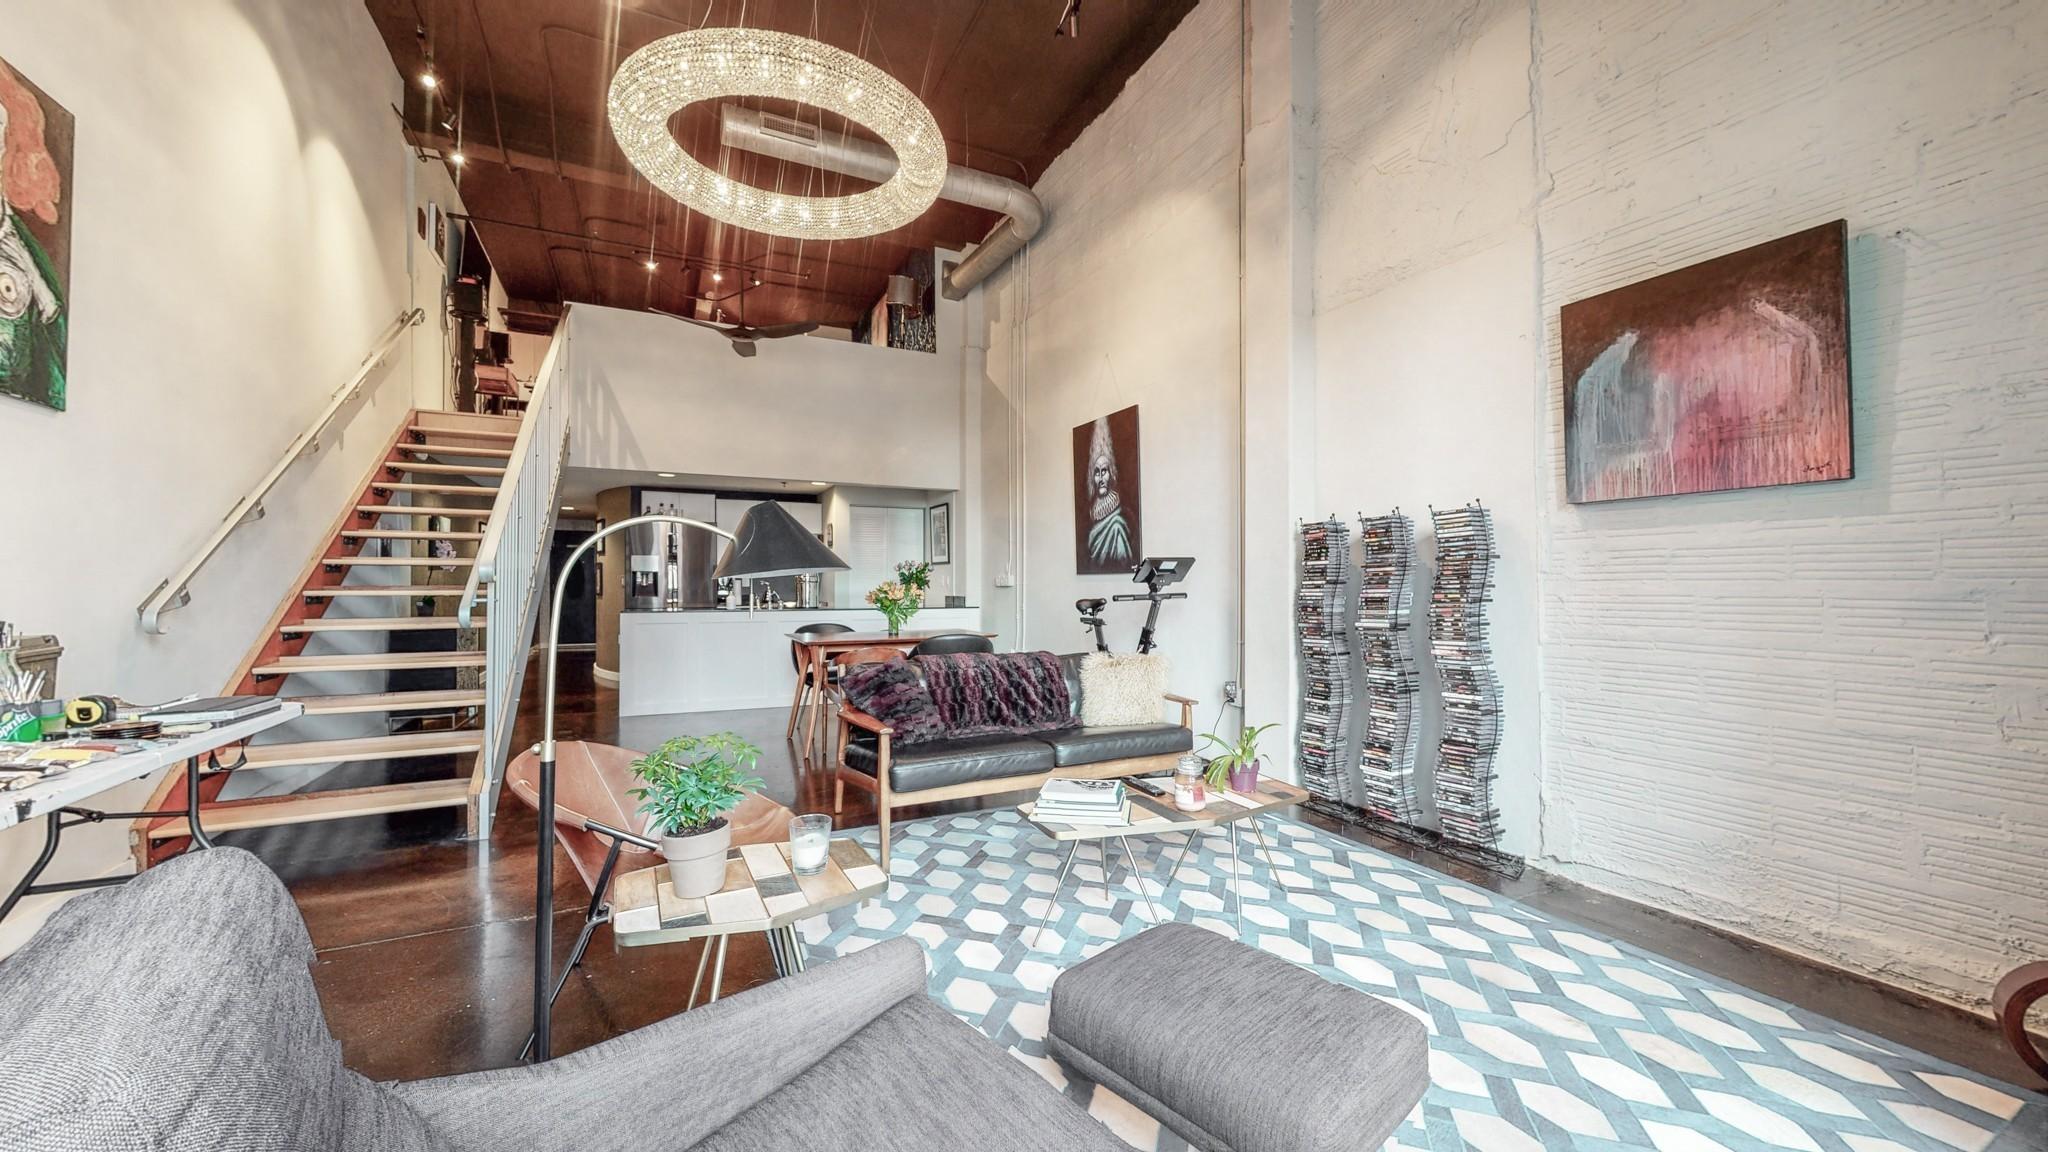 239 5th Ave N #505 Property Photo - Nashville, TN real estate listing